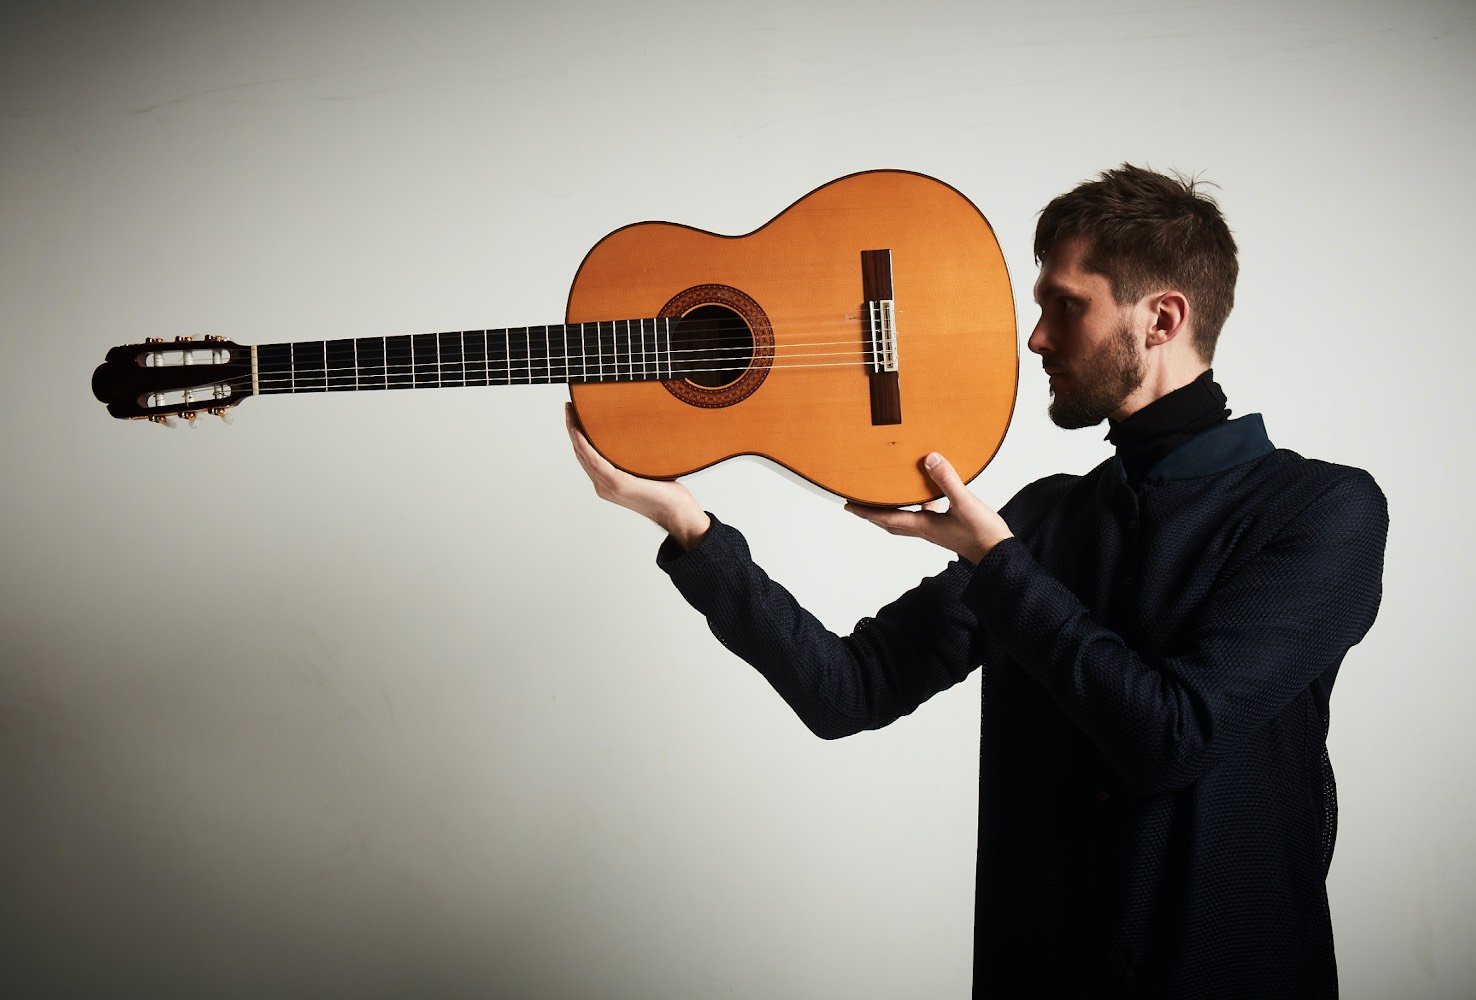 James Labrosse_guitar.jpeg